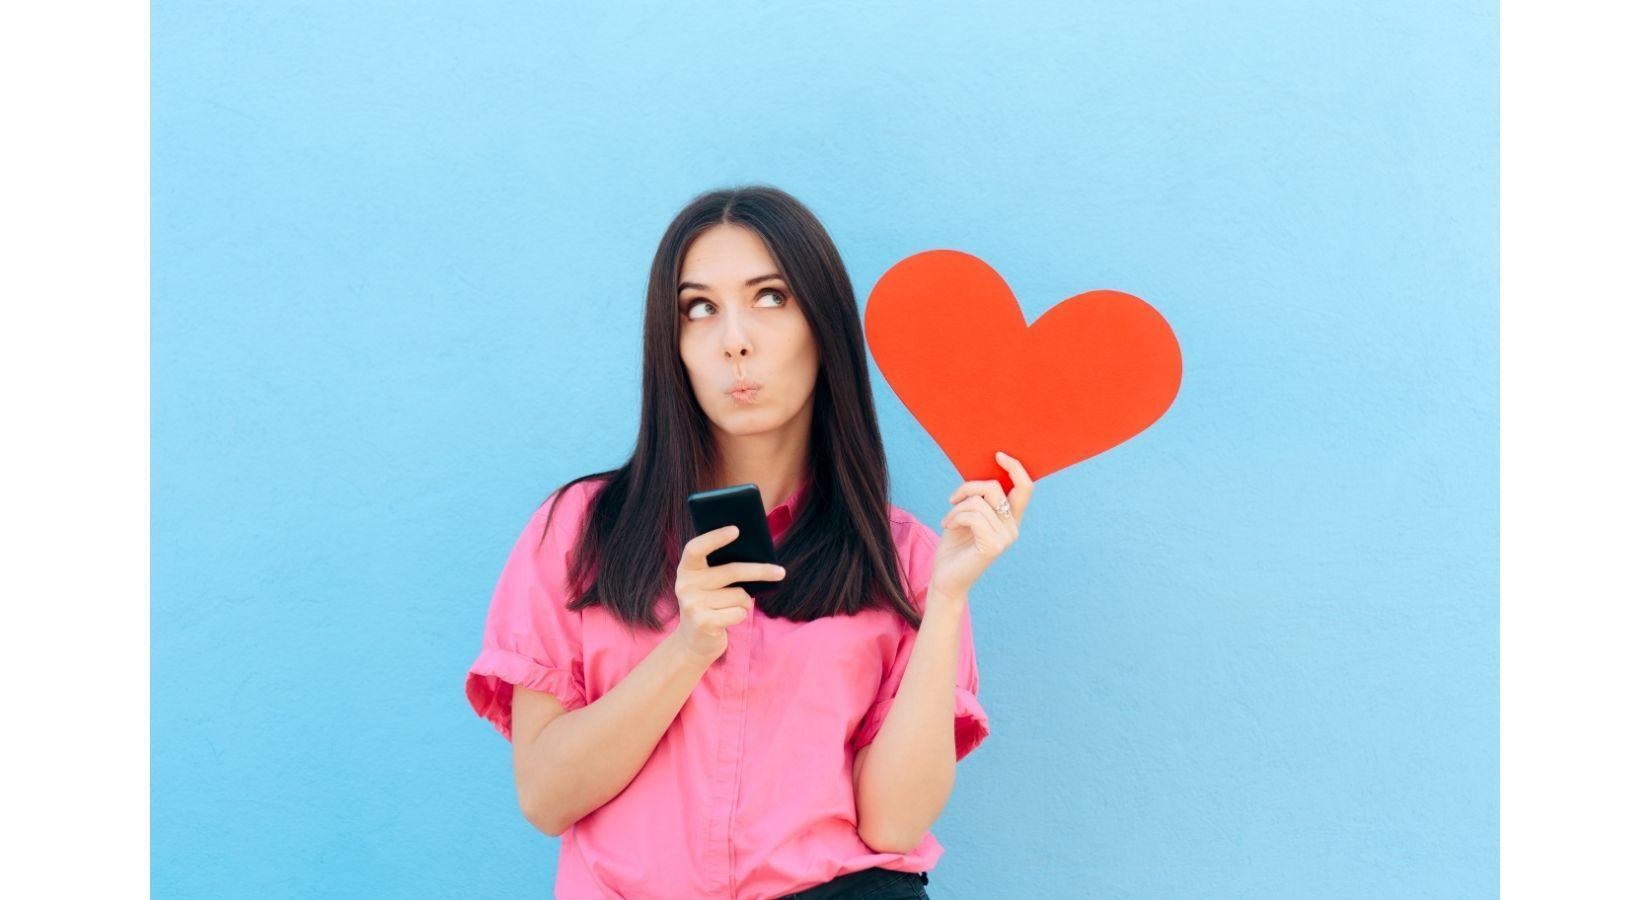 девушка с телефоном и сердцем